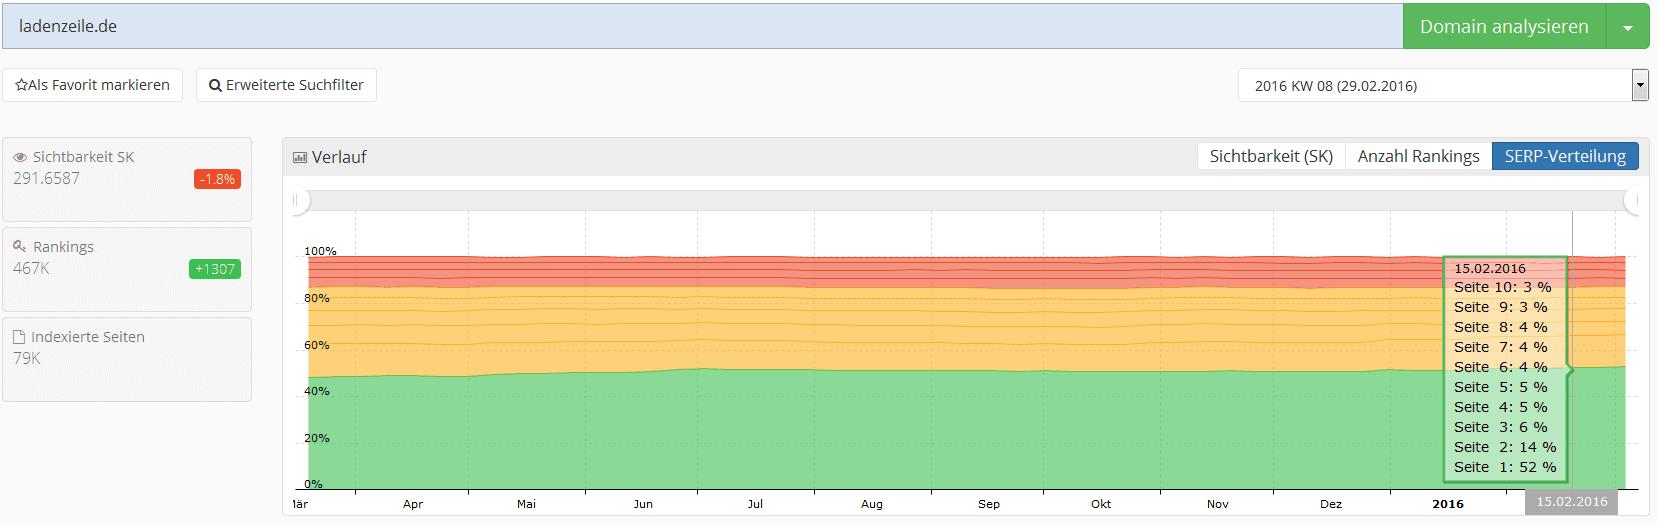 metrics tools Dashboard SERP Verteilung